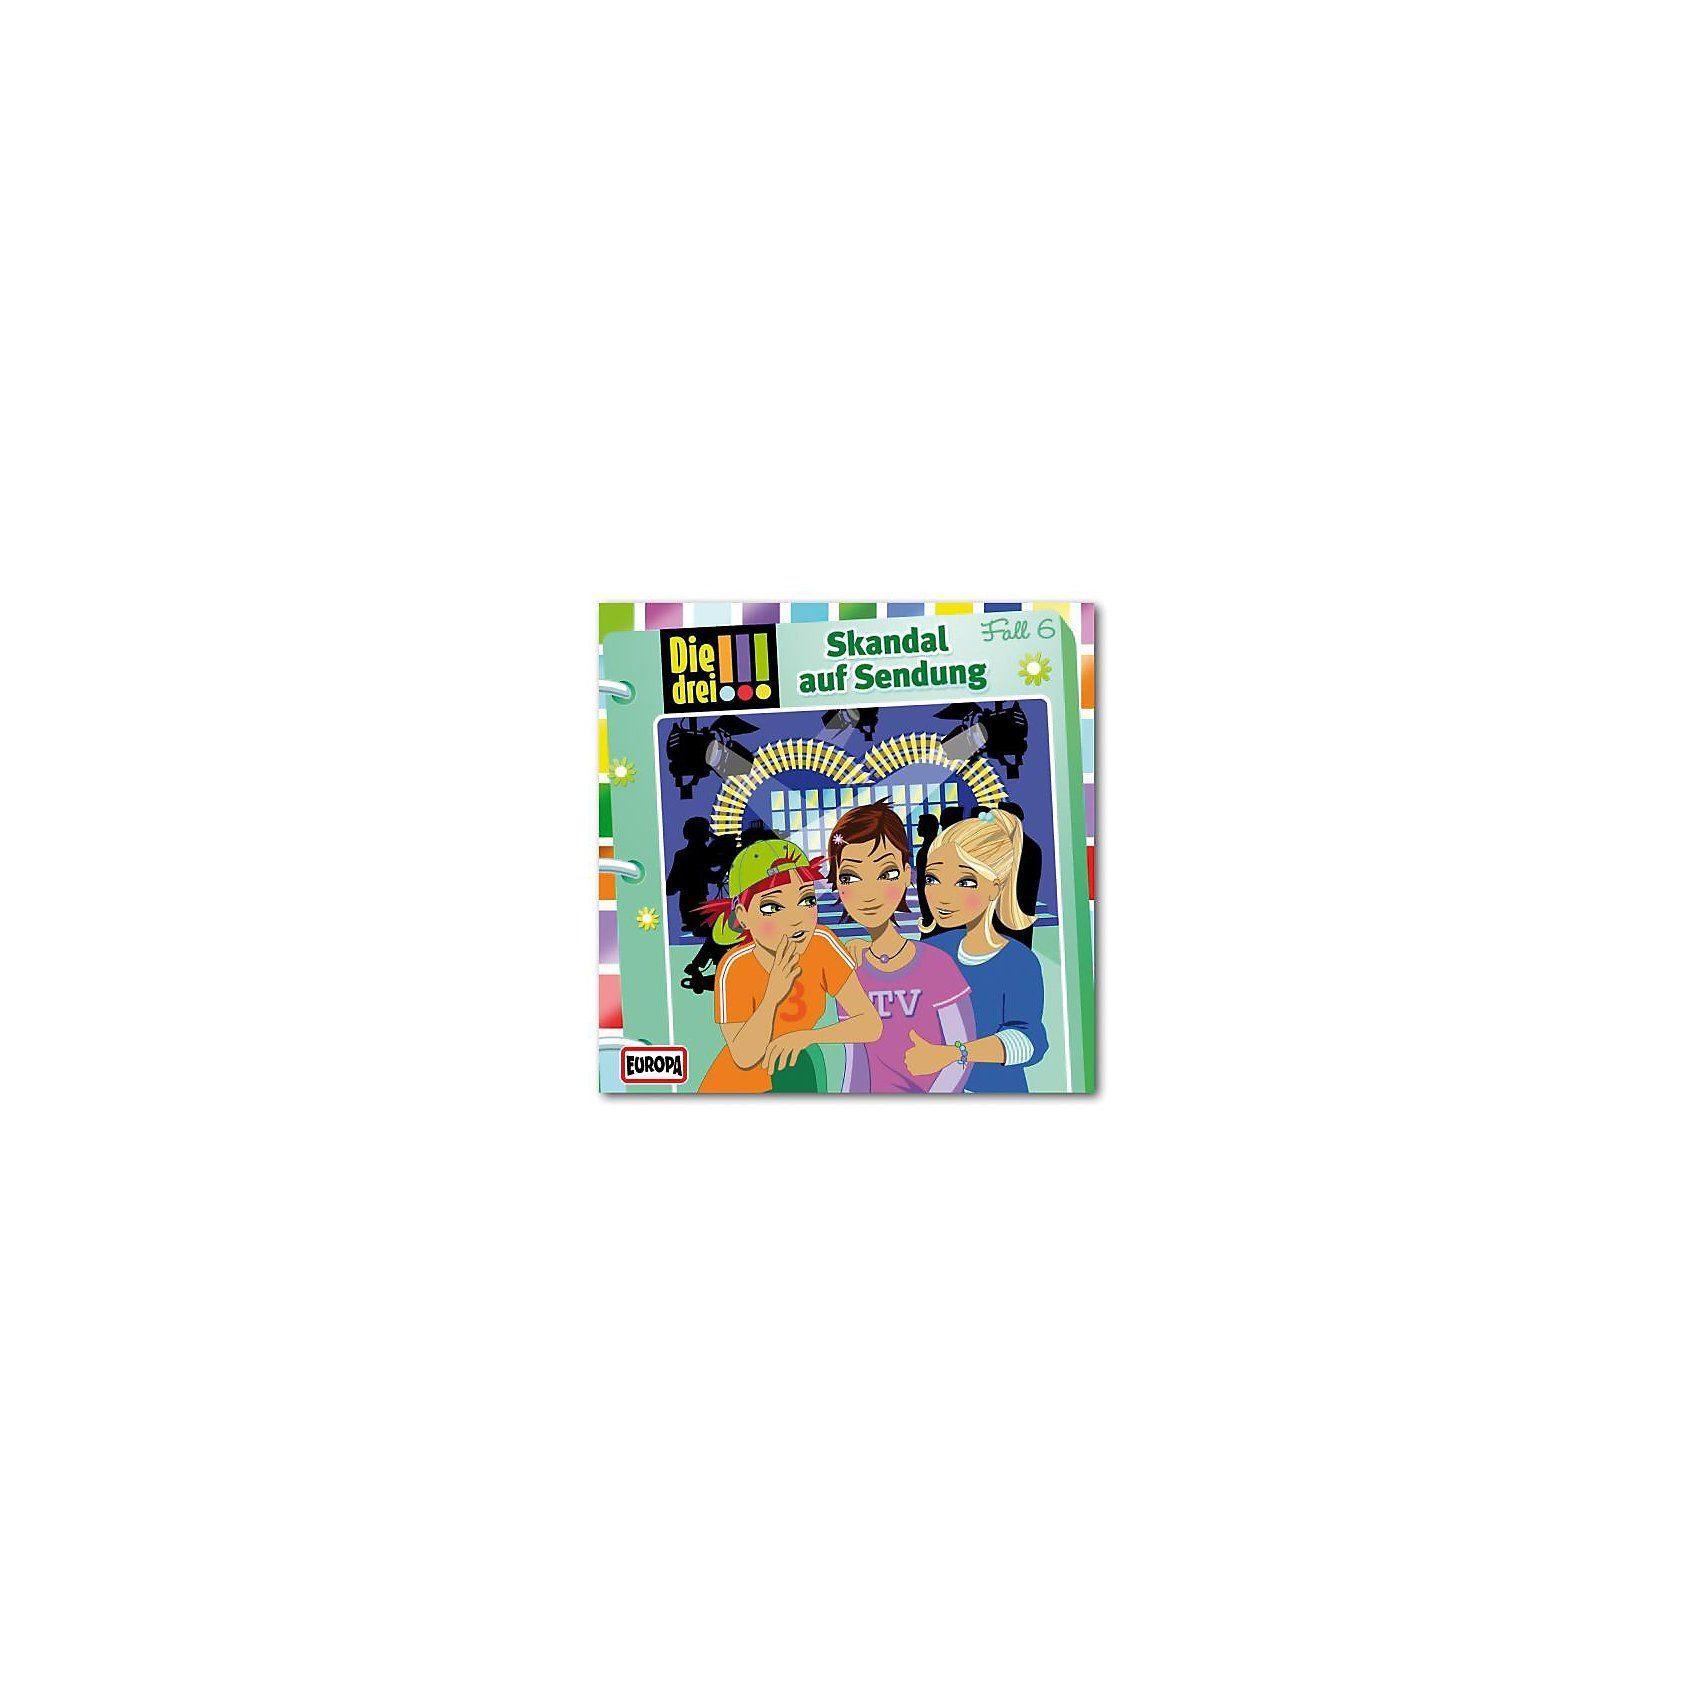 Sony CD Die Drei !!! 06 - Skandal auf Sendung